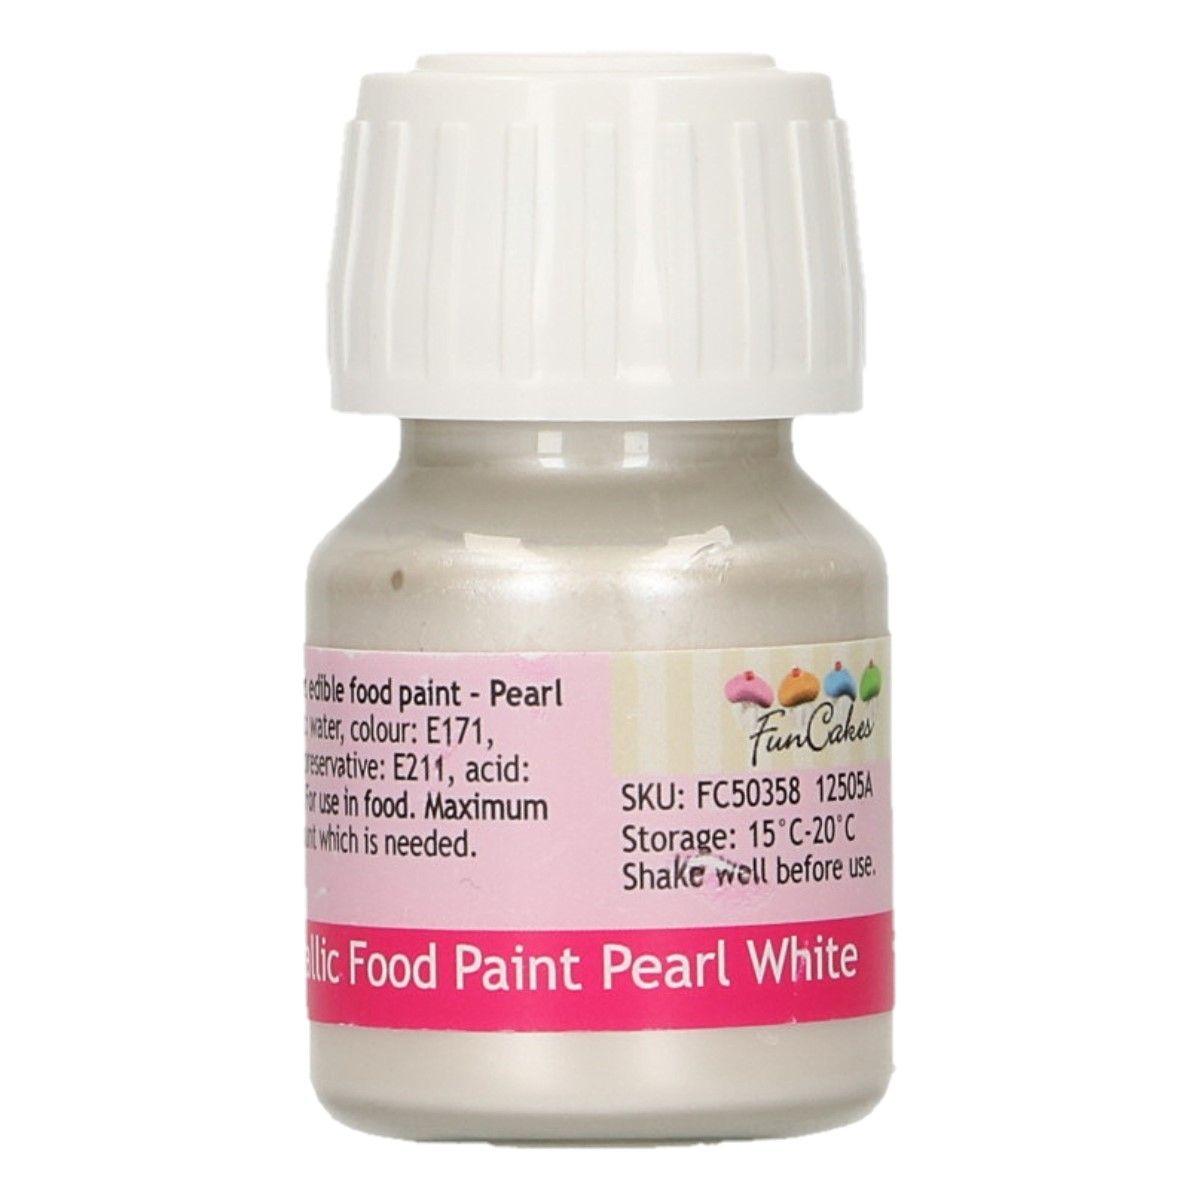 FunColours Metallic Food Paint Pearl White